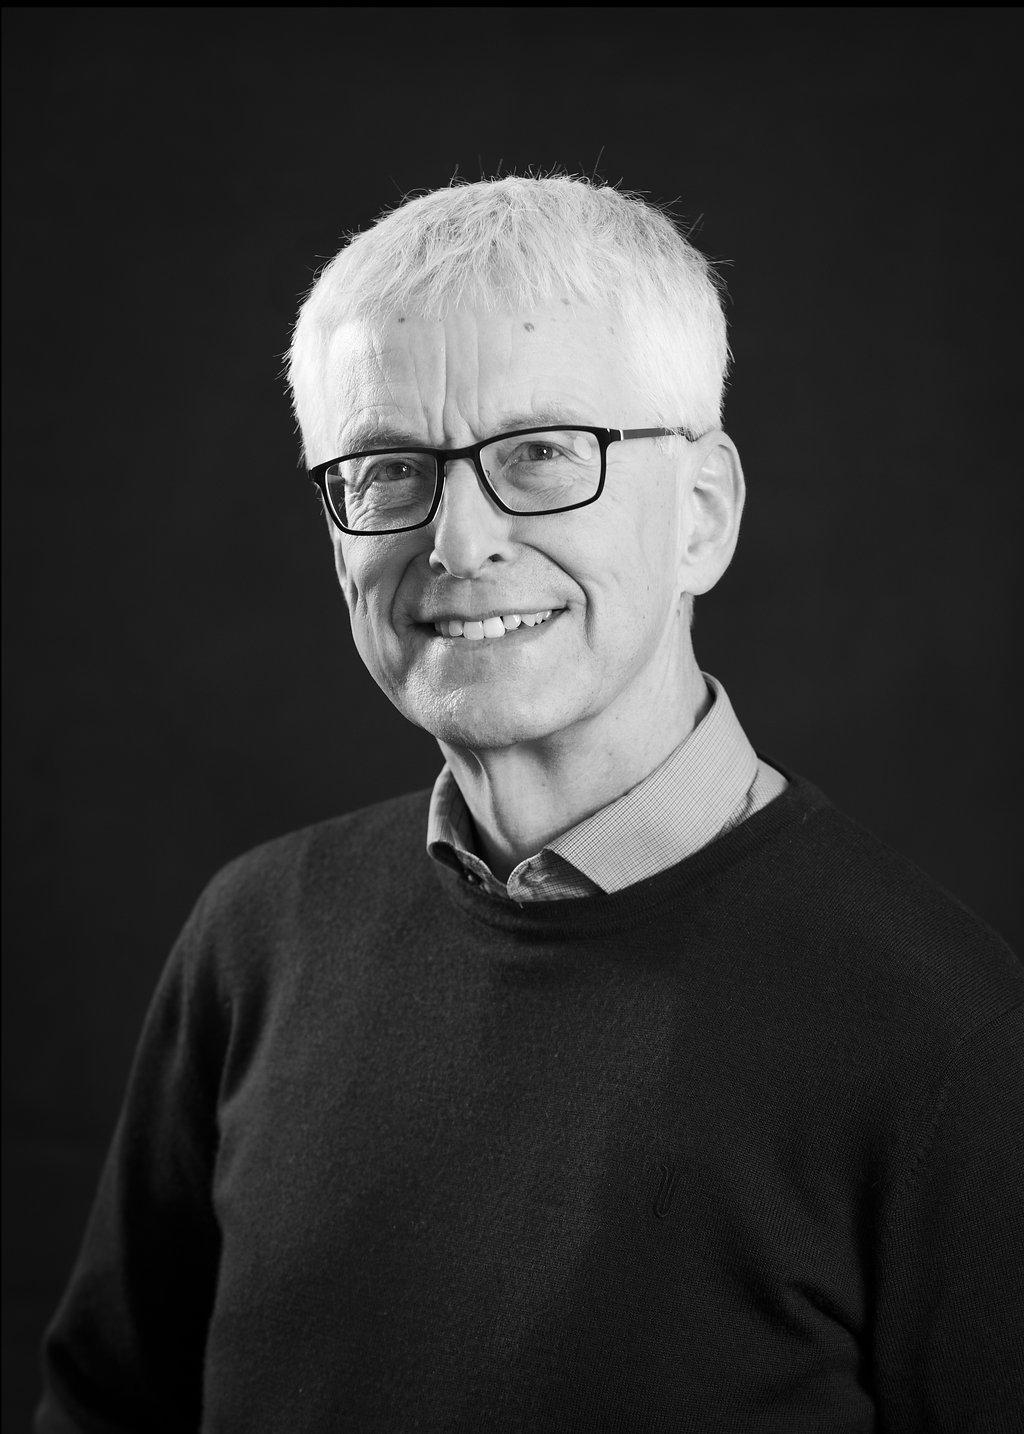 Poul Mikkelsen